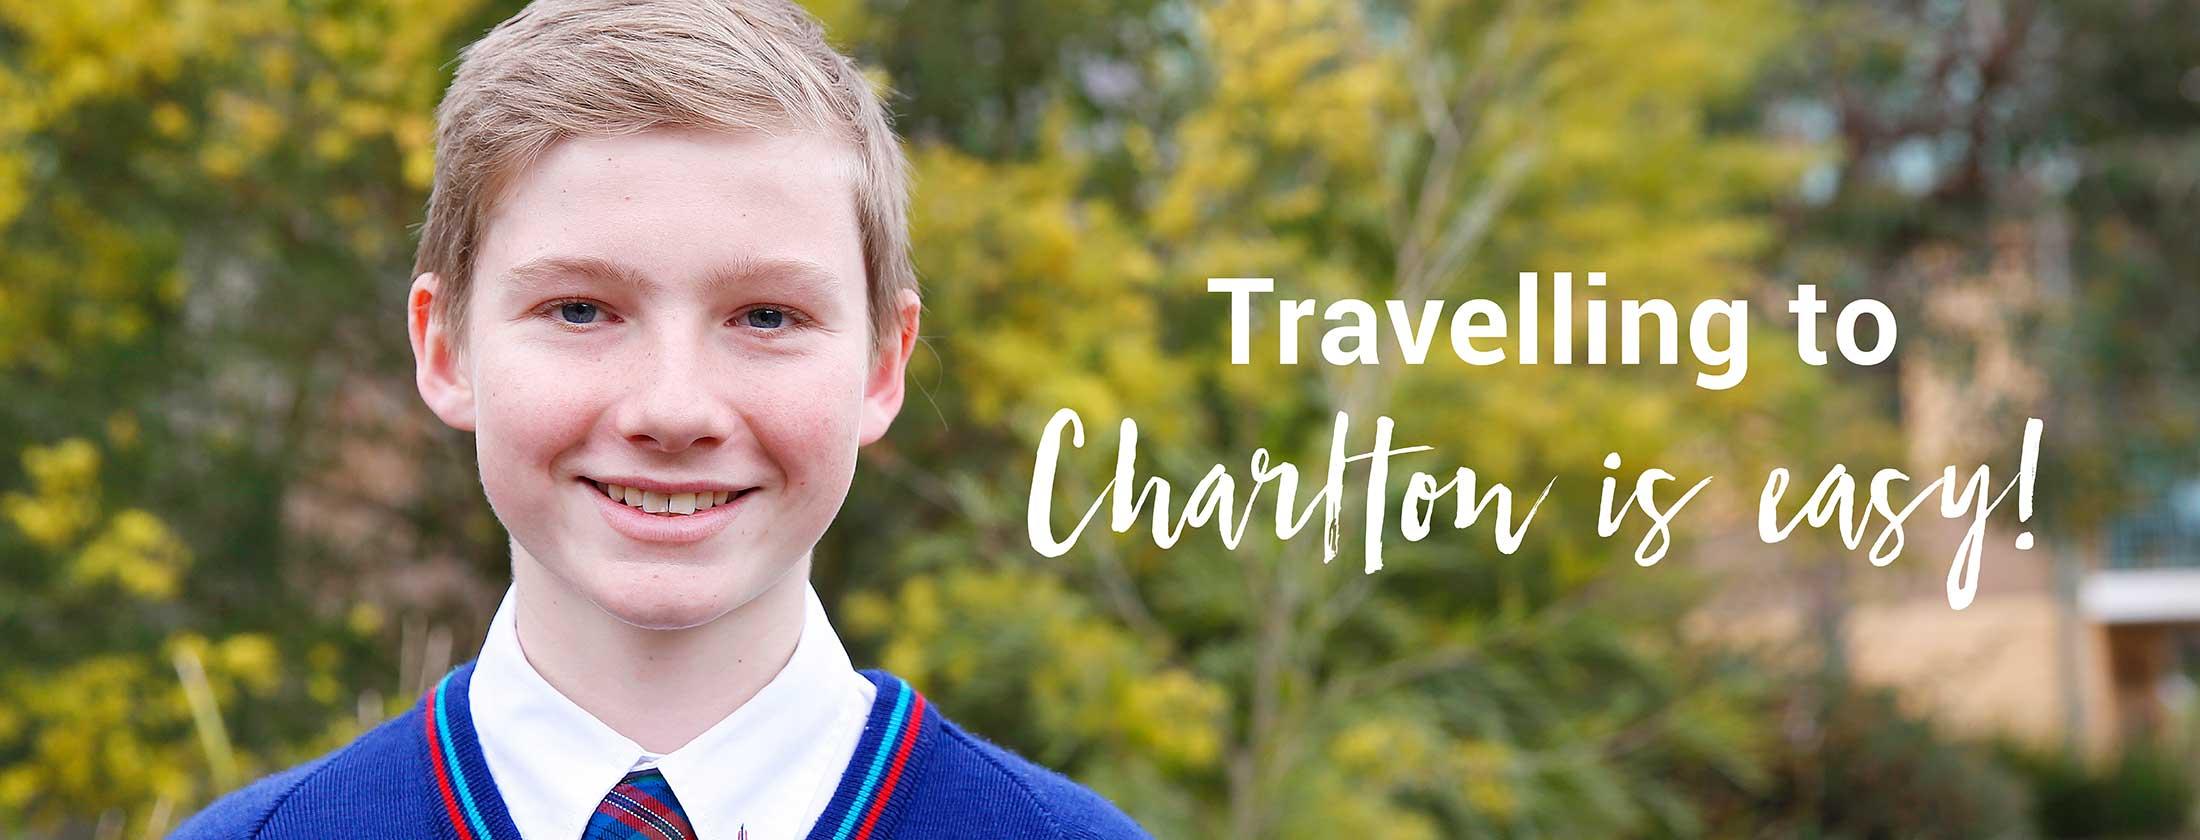 travel public transport bus buses charlton christian college